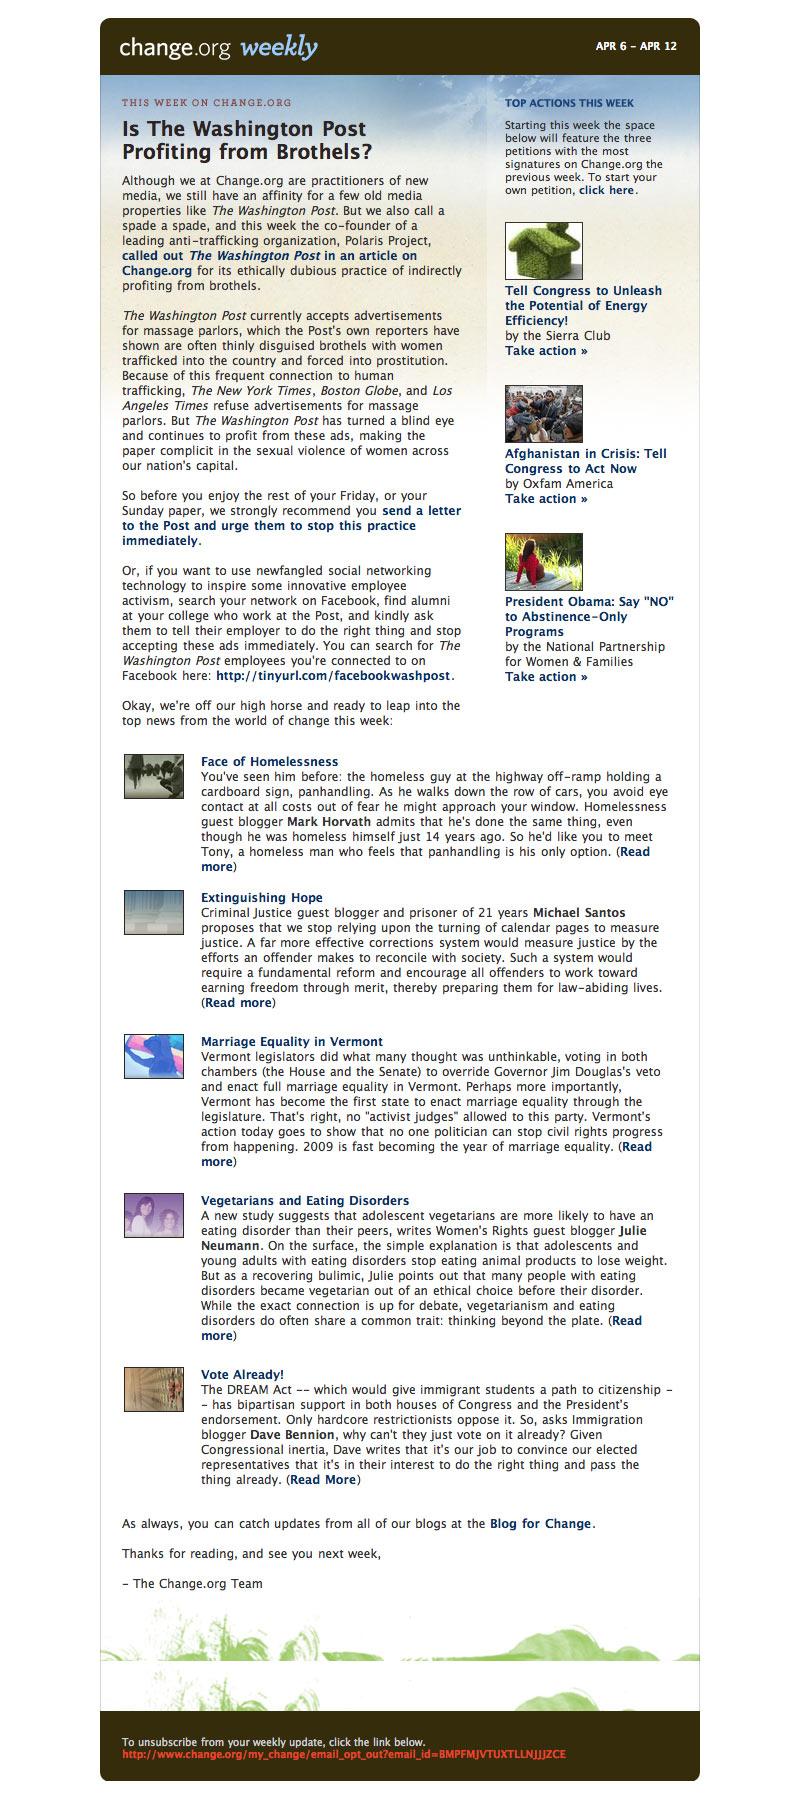 ChangeOrg-Newsletter-0409 email